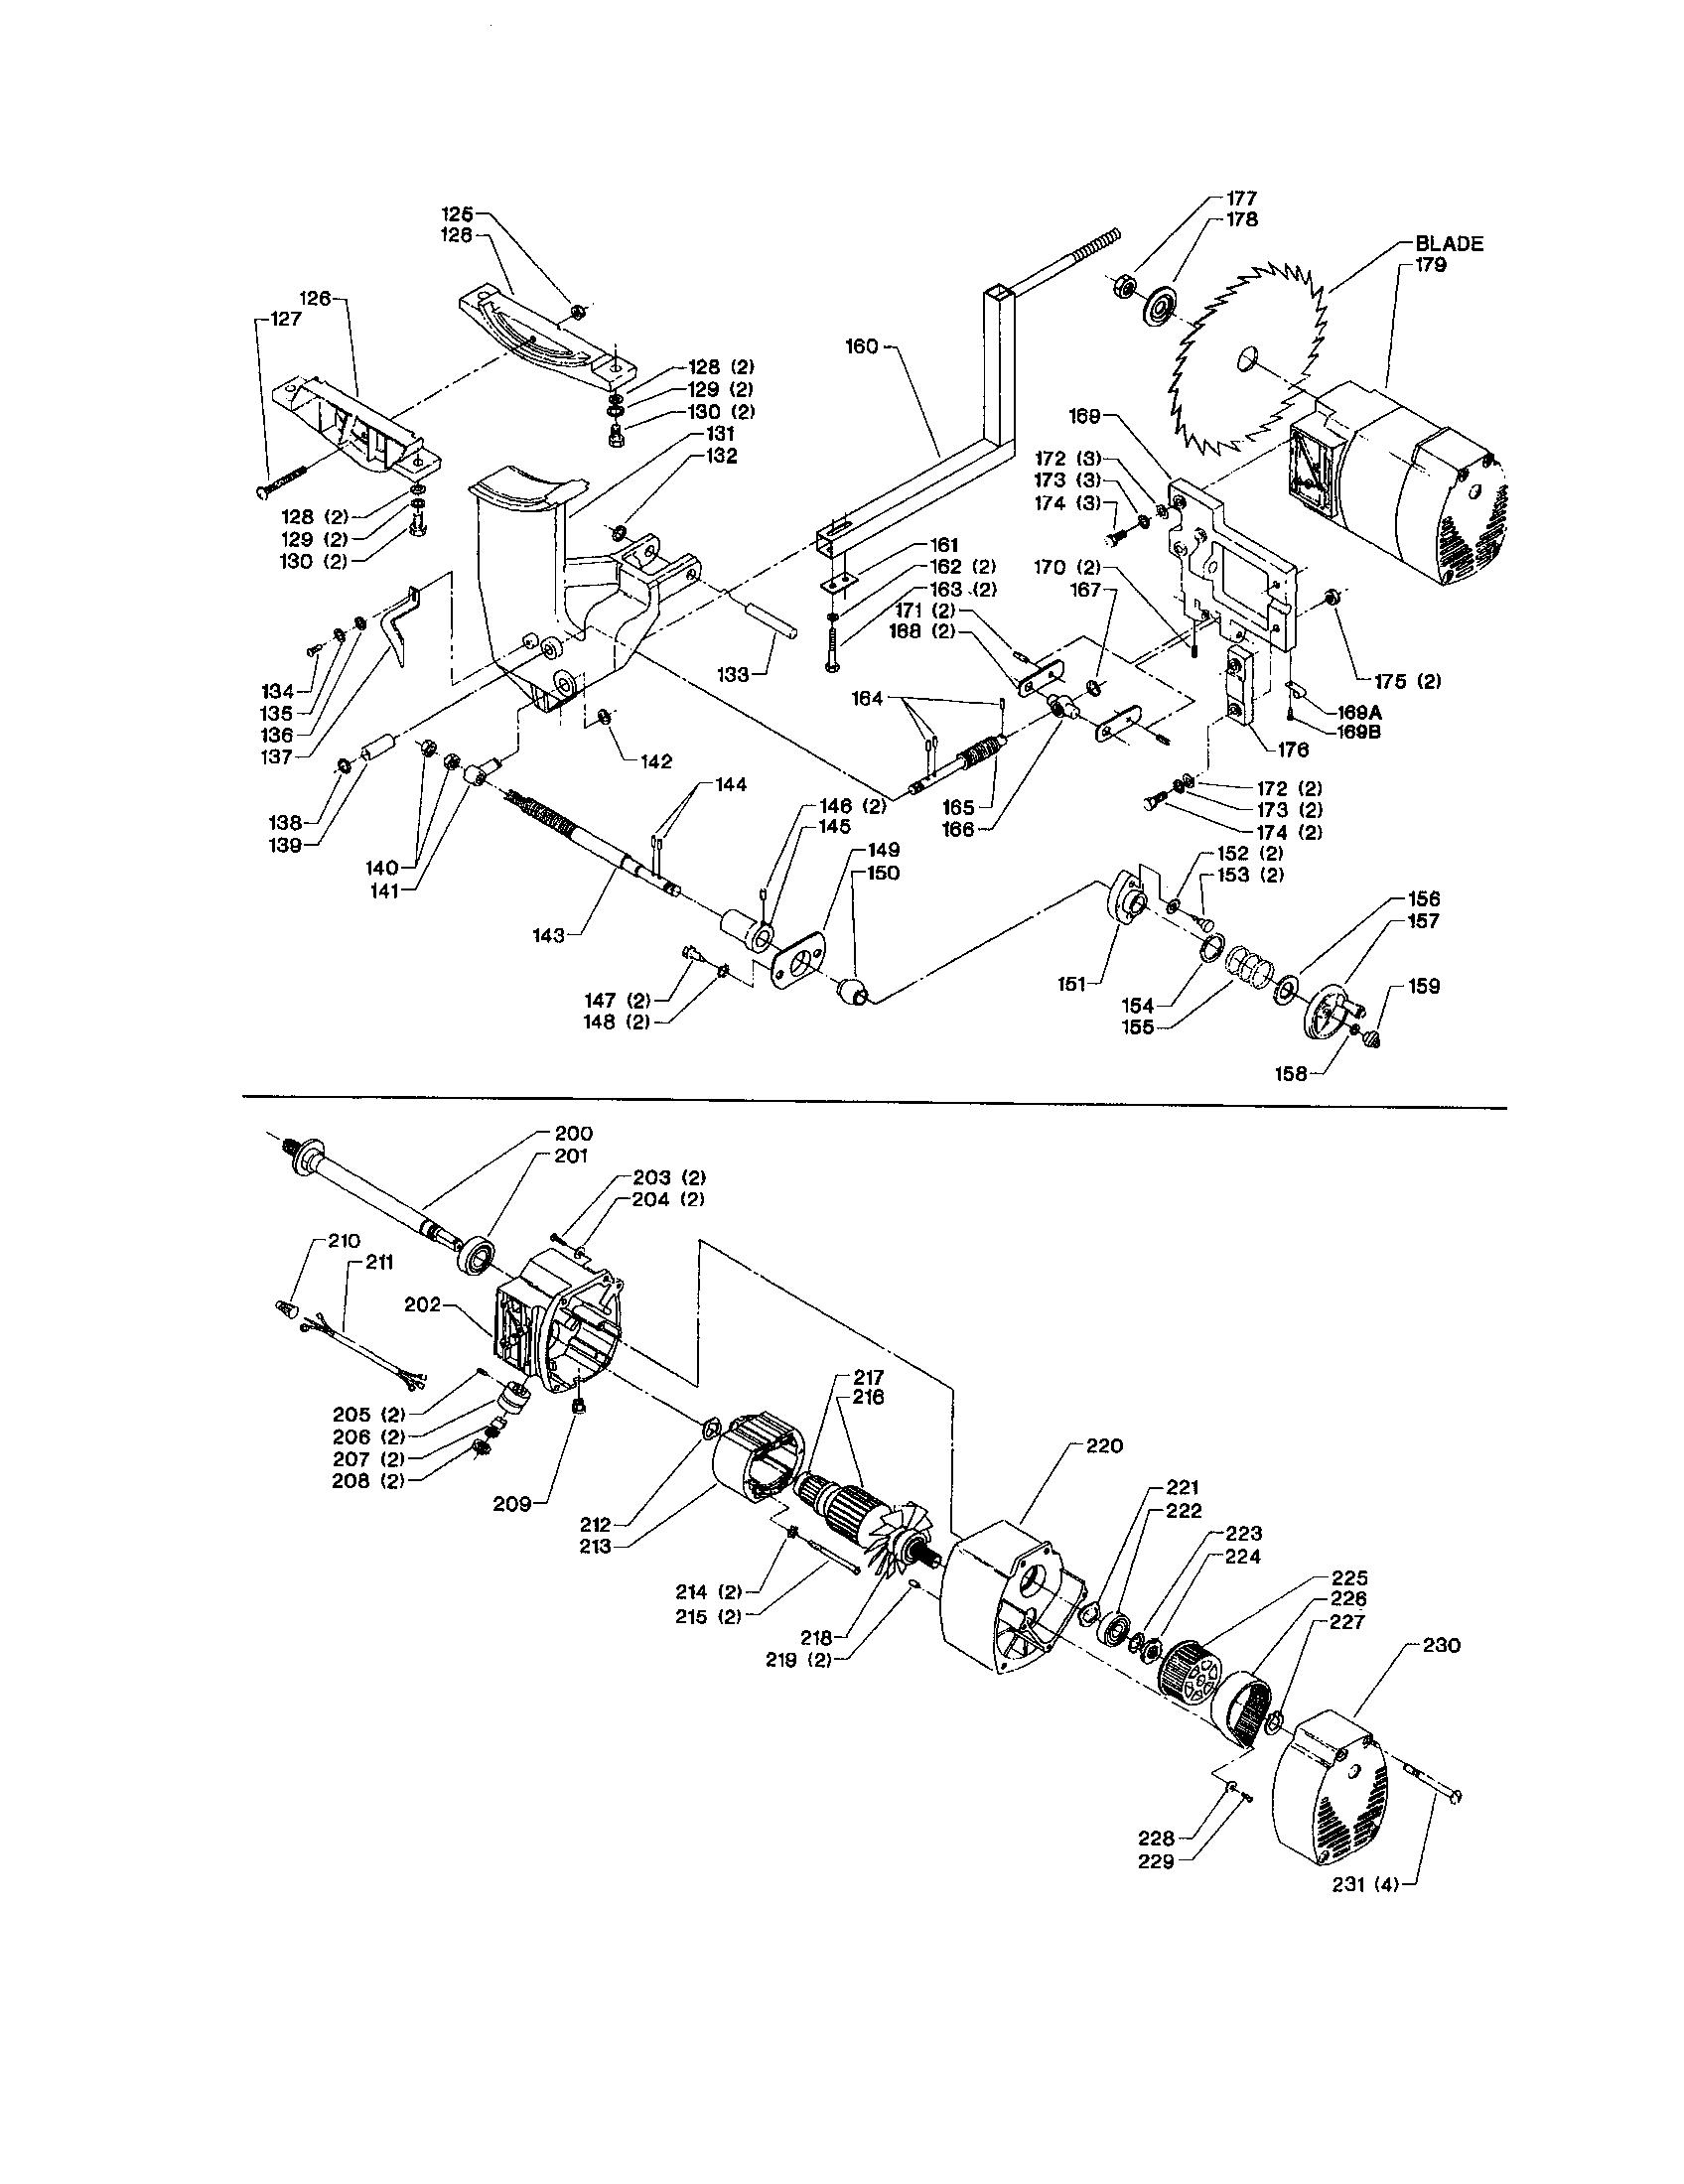 Ridgid Table Saw Motor Replacement